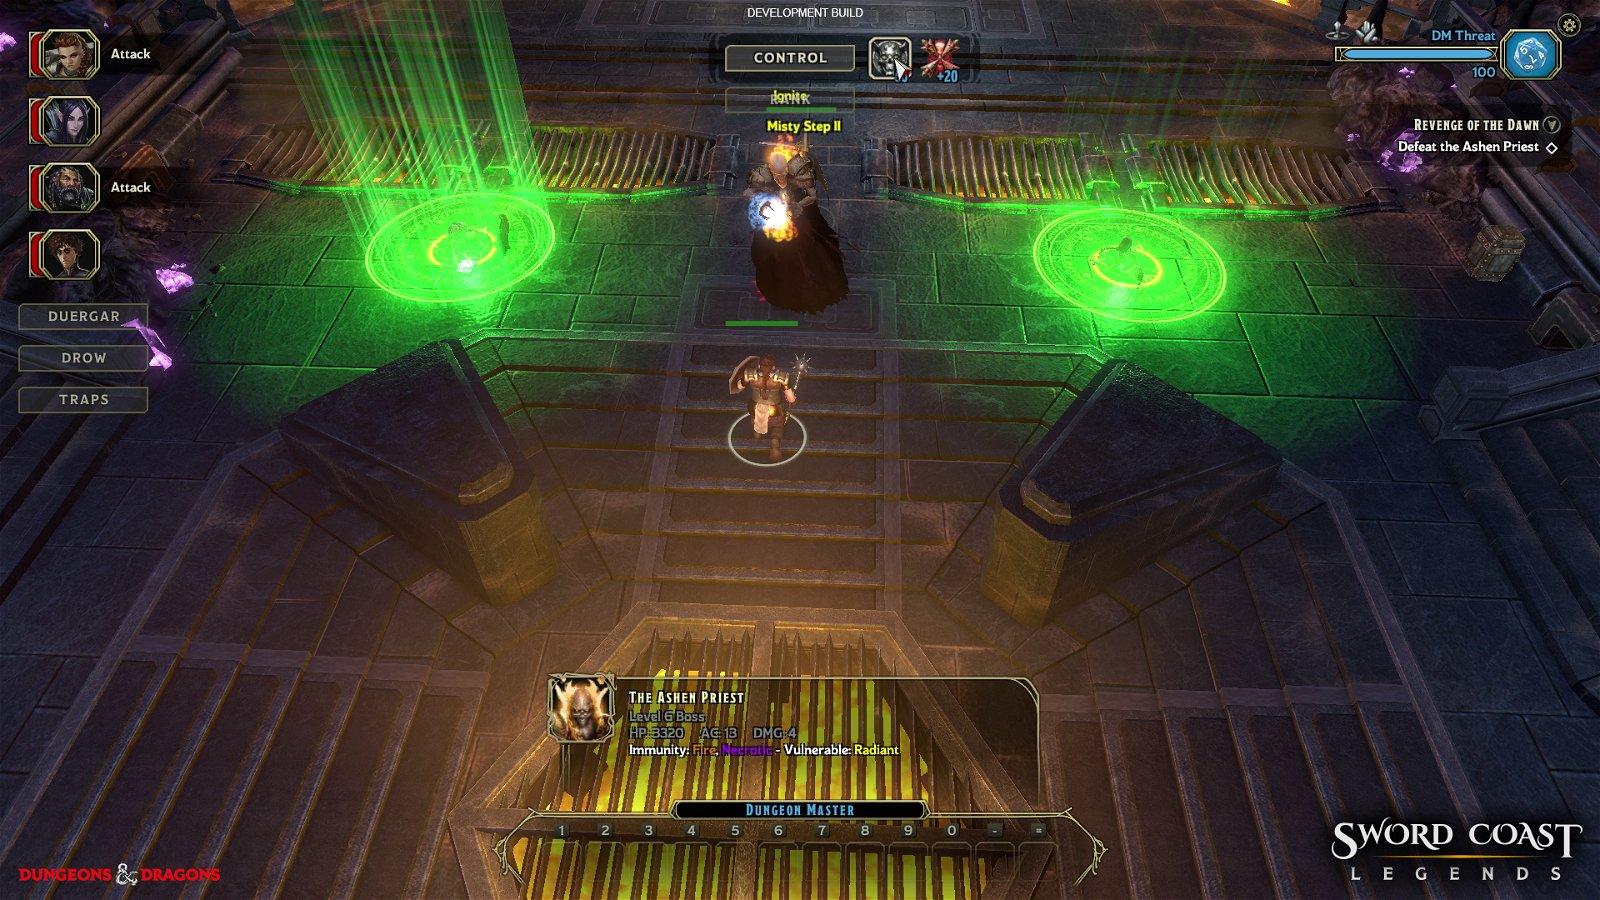 Dungeon Master Mode